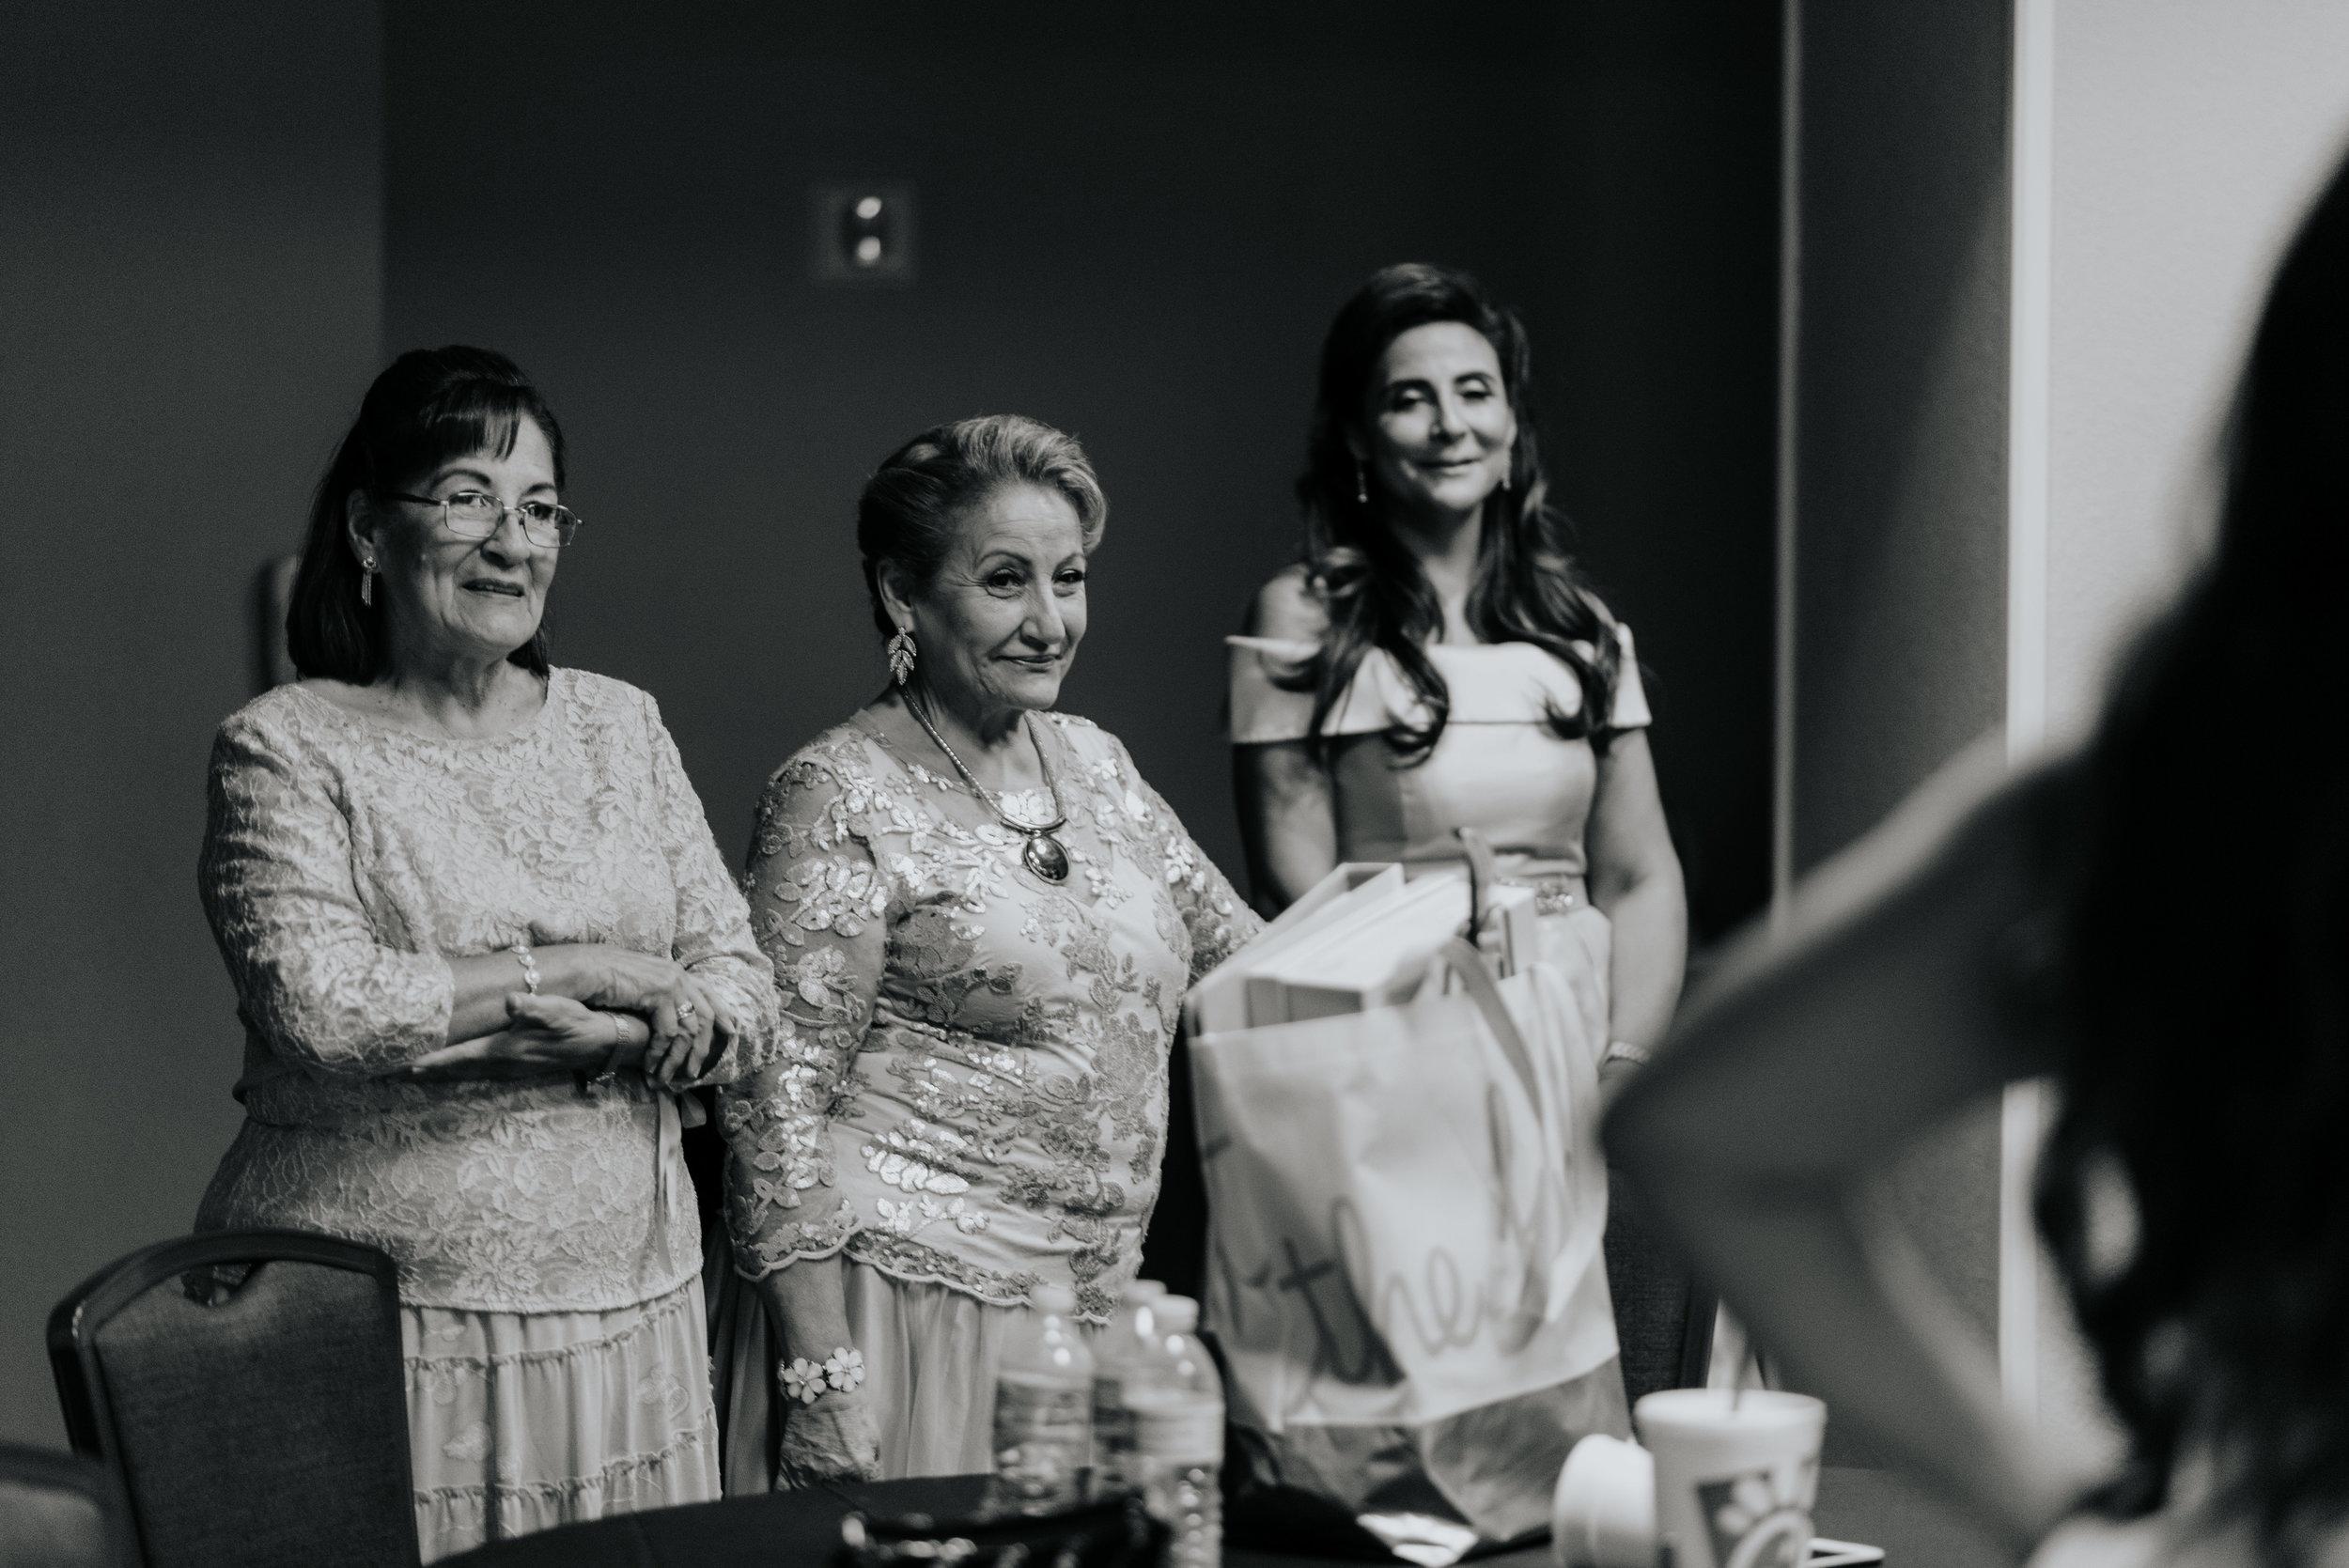 Tatiana-Javier-Wedding-3233.jpg